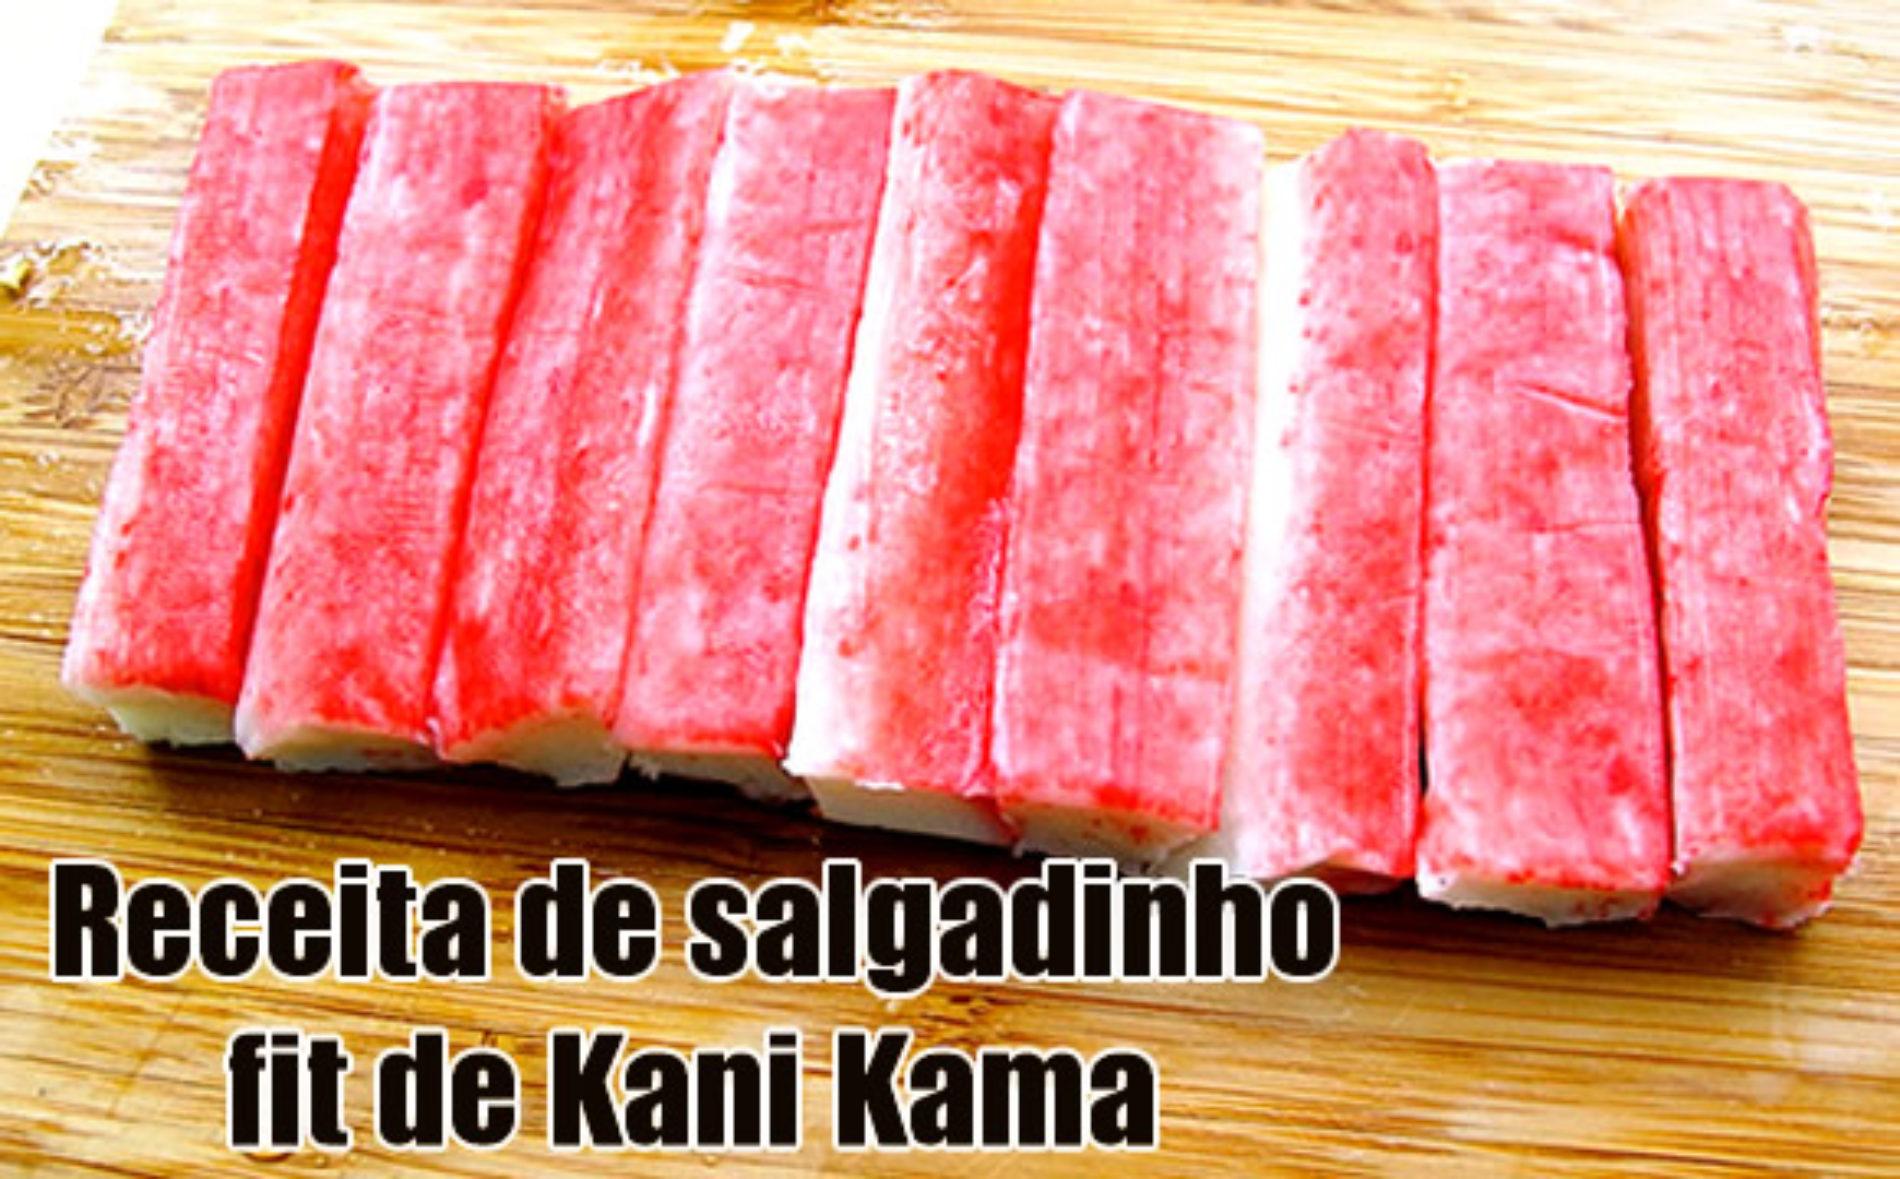 Salgadinho Chips FITNESS de Kani Kama